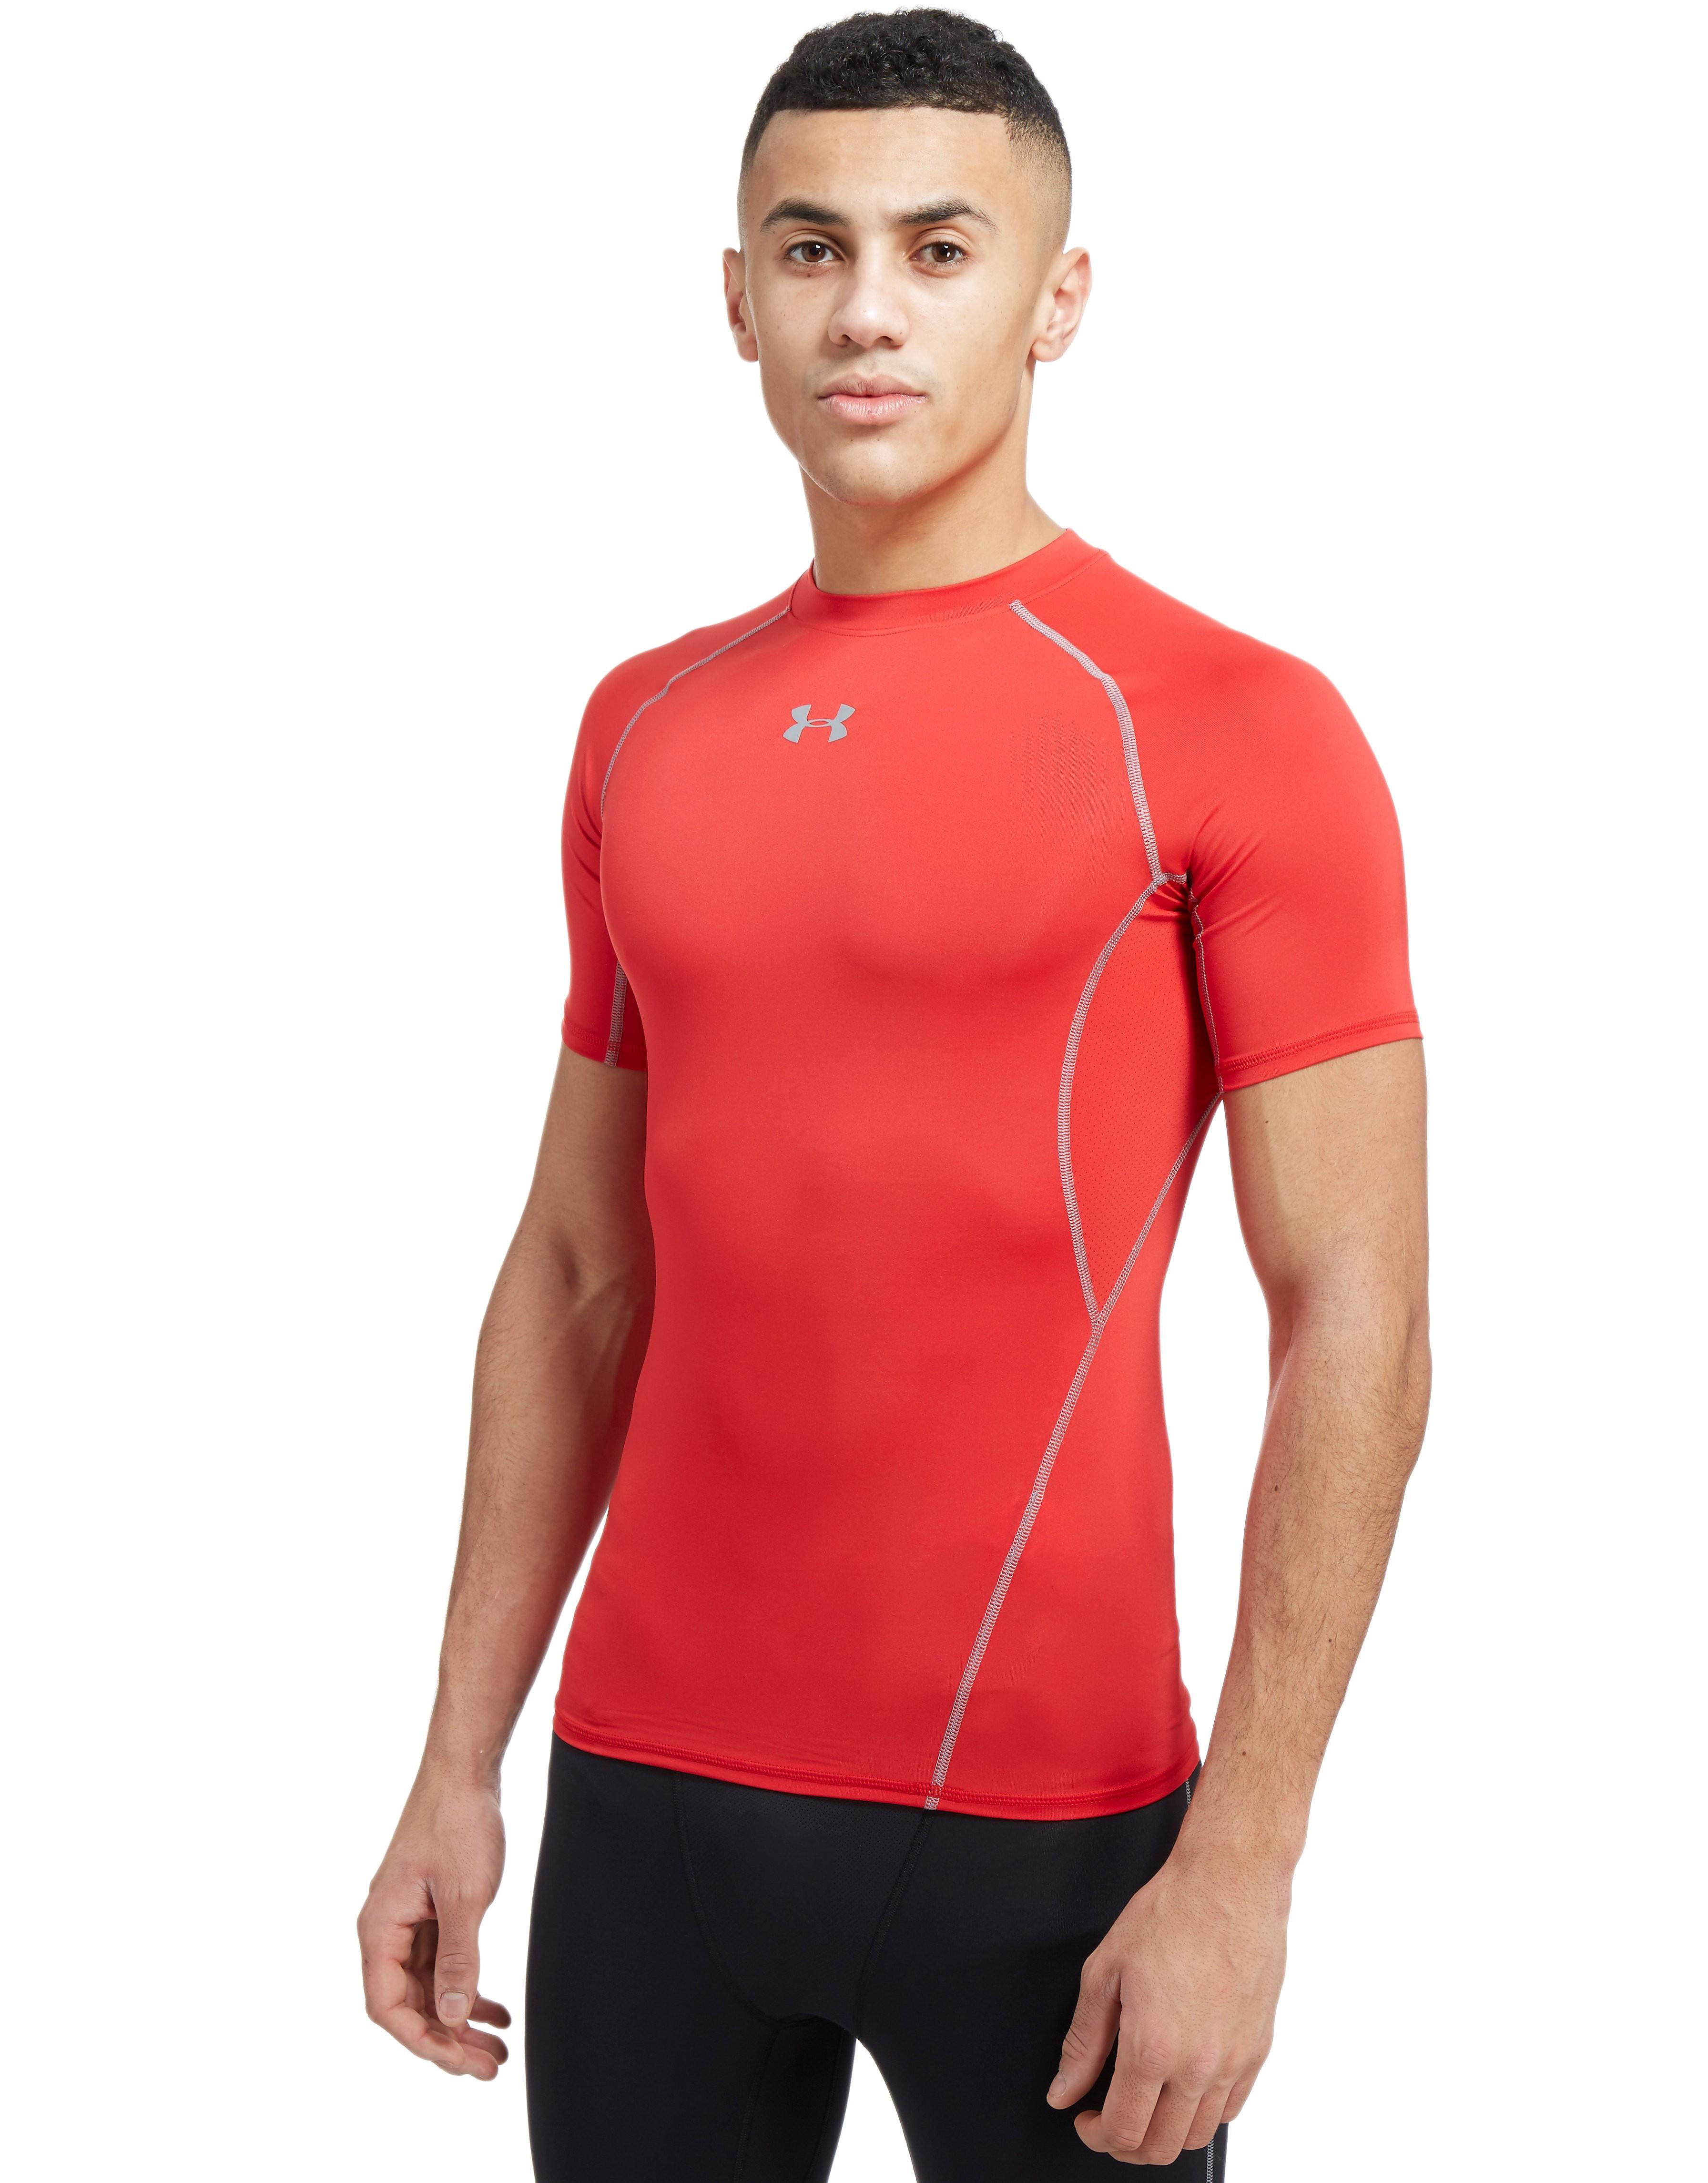 Under Armour HeatGear Compression T-Shirt Heren - Rood - Heren